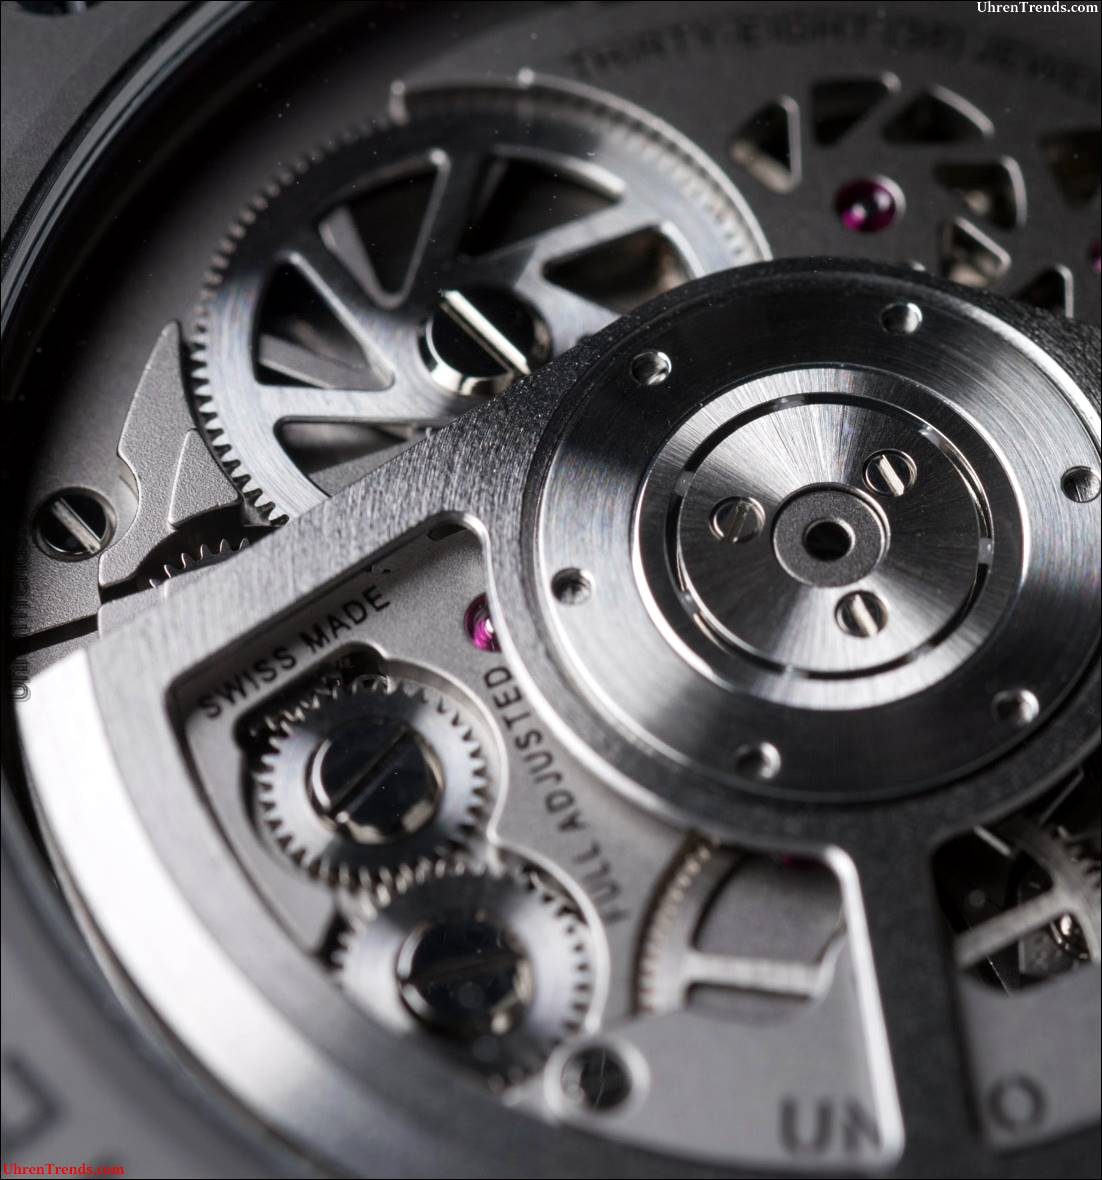 Hublot Big Bang Unico Magic Gold Watch Review - Wie magisch ist es?